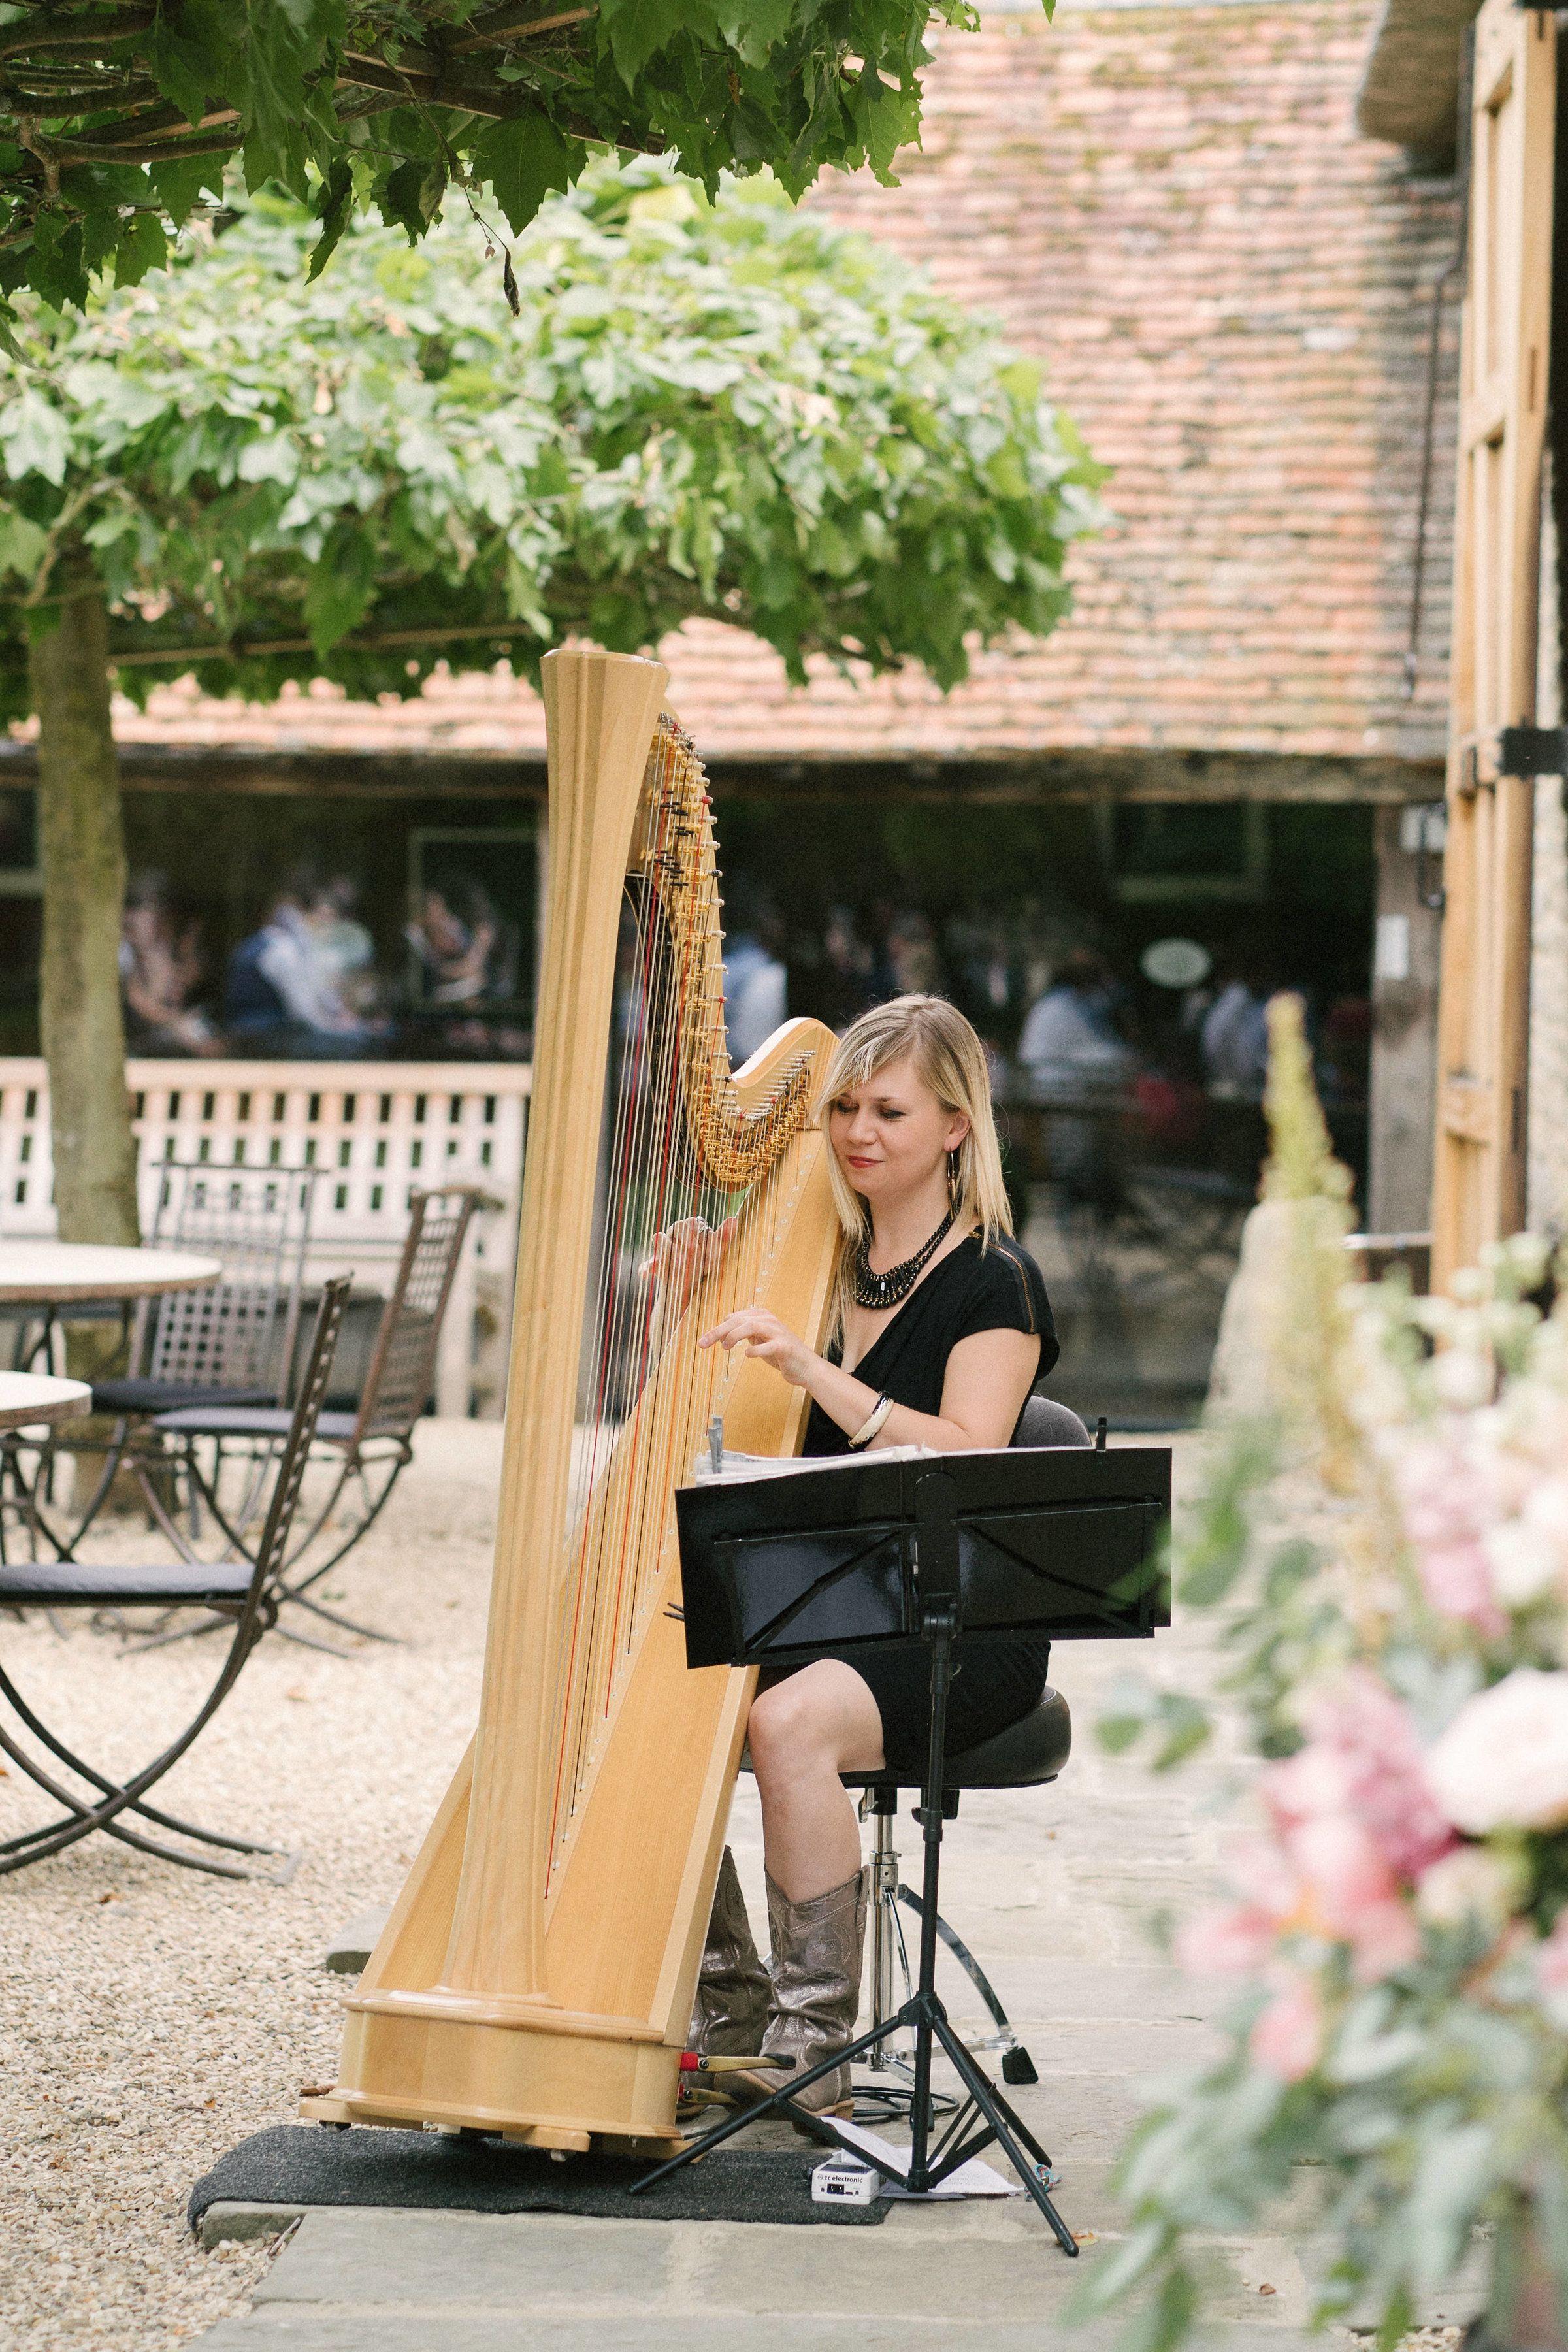 Wedding Music Wedding music, Barn wedding venue, Music blog